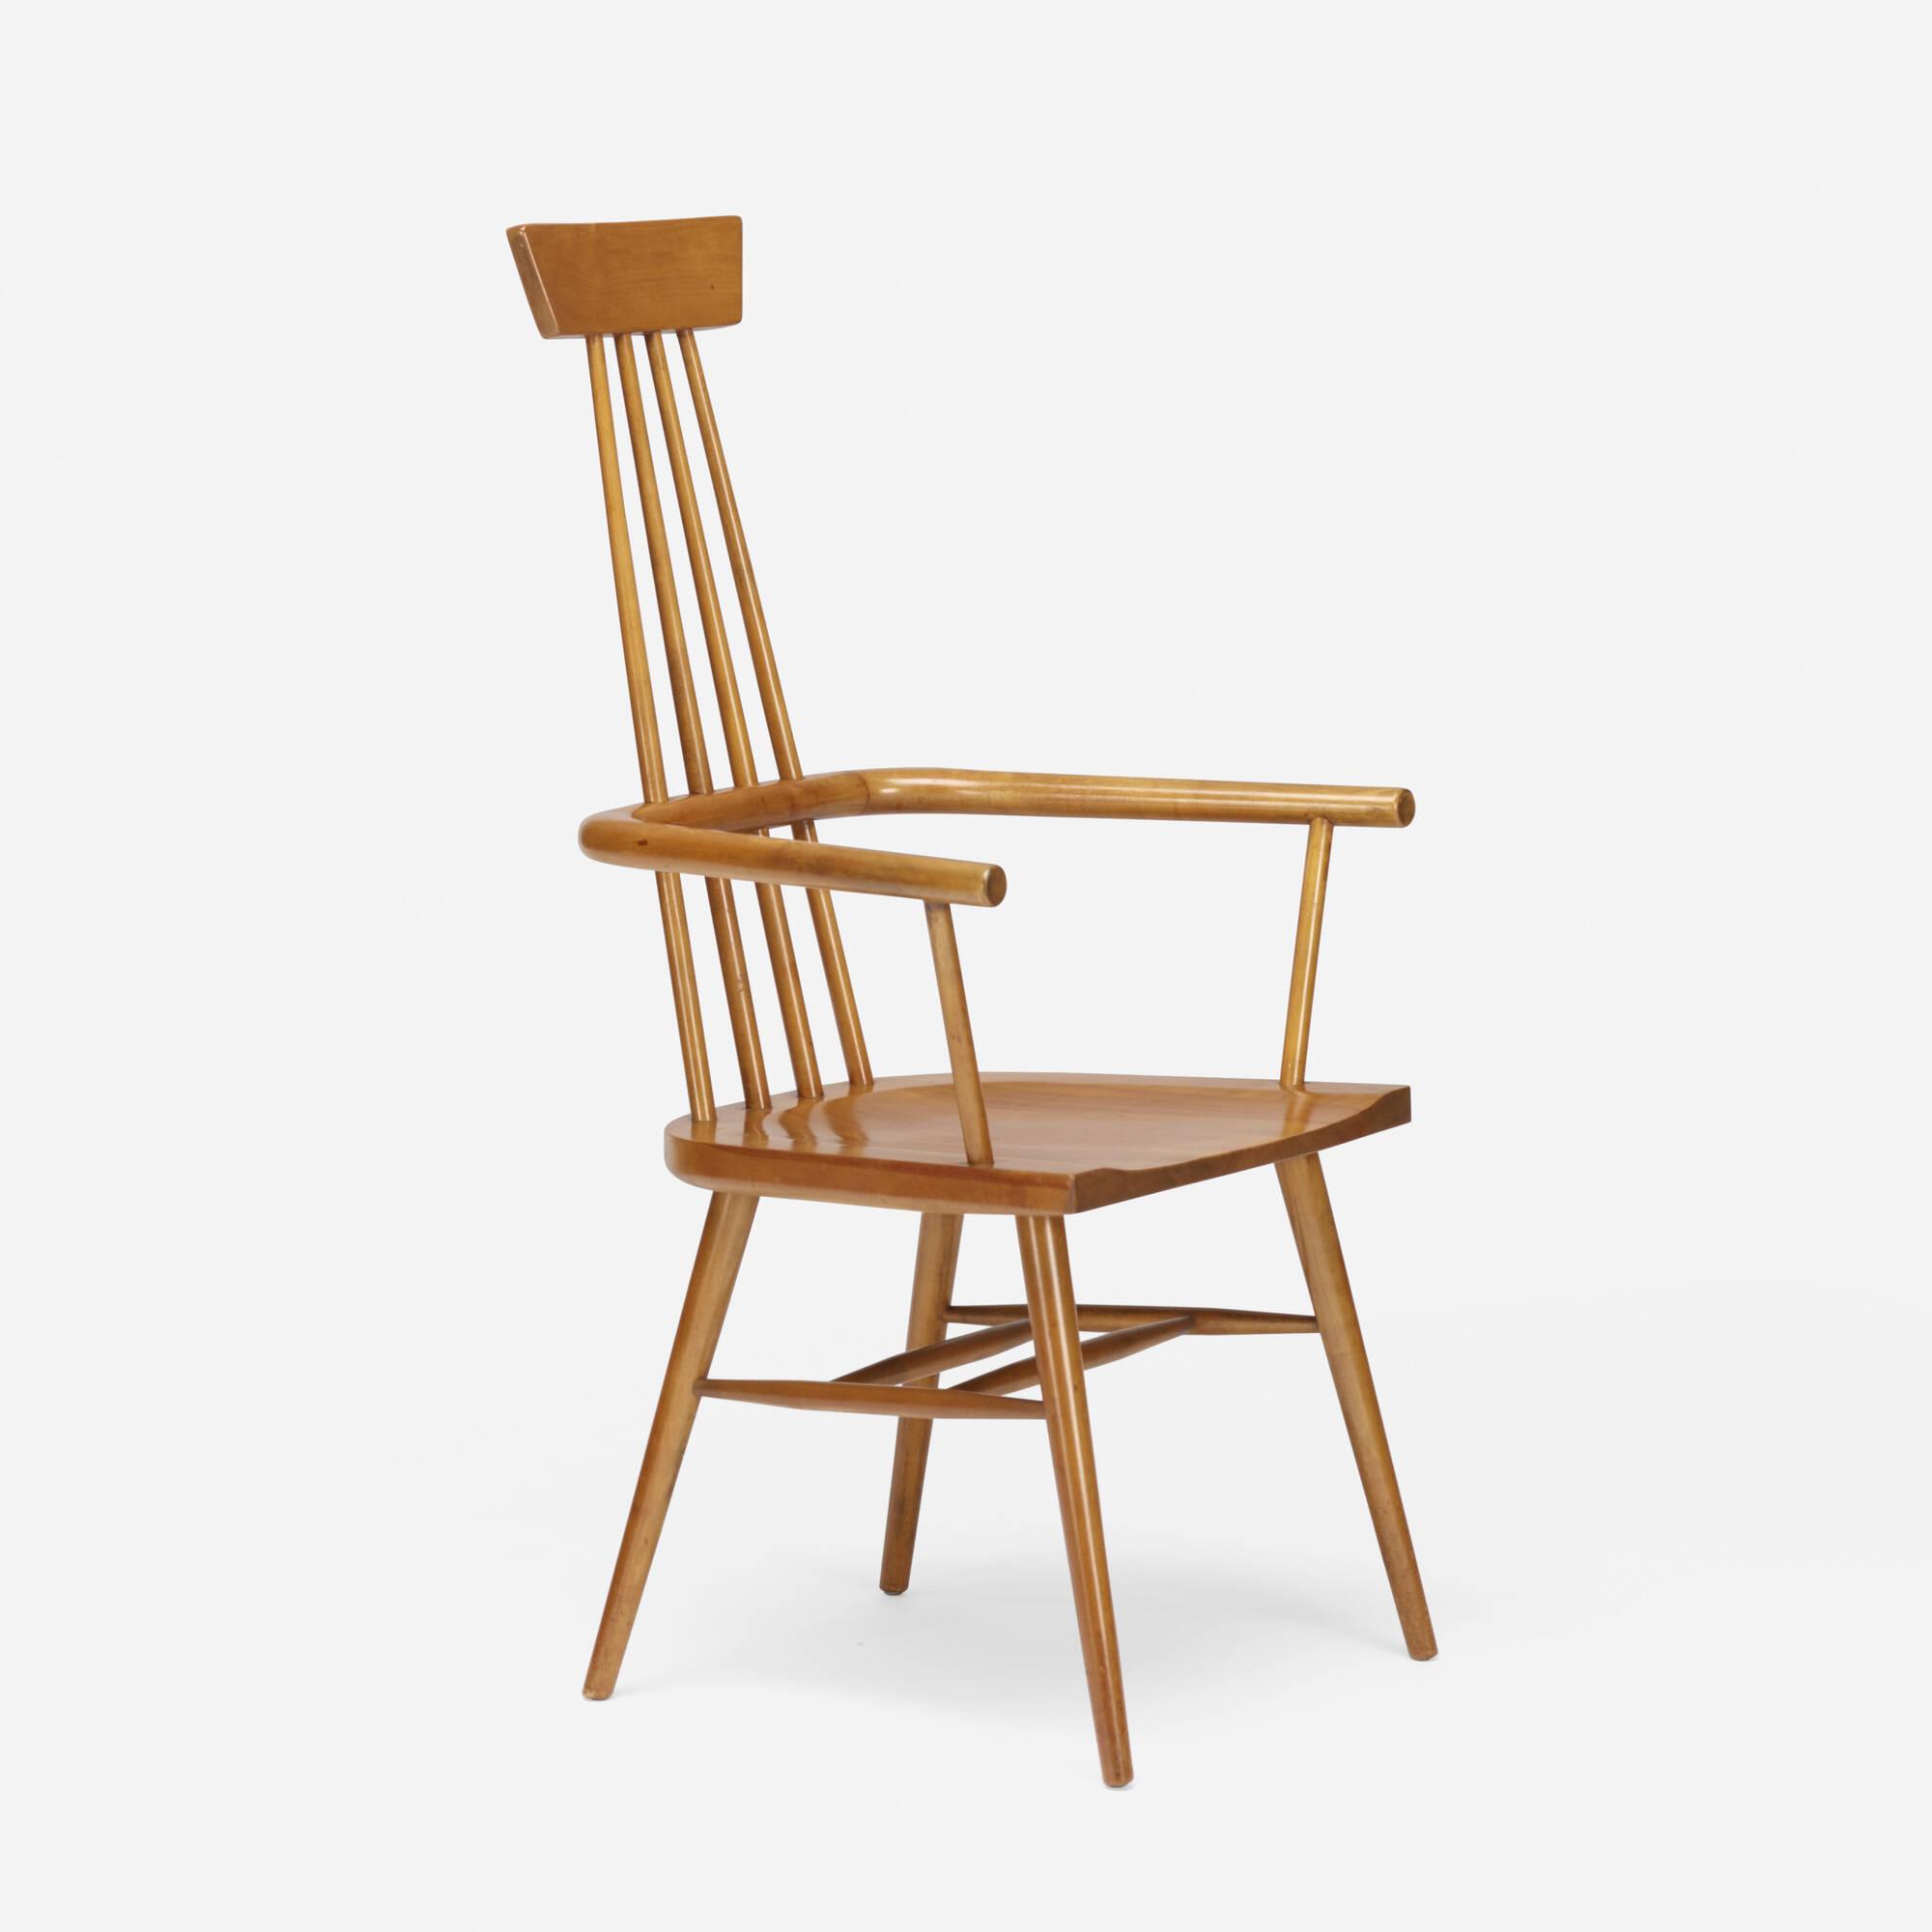 425: Paul McCobb / Windsor chair (1 of 2)